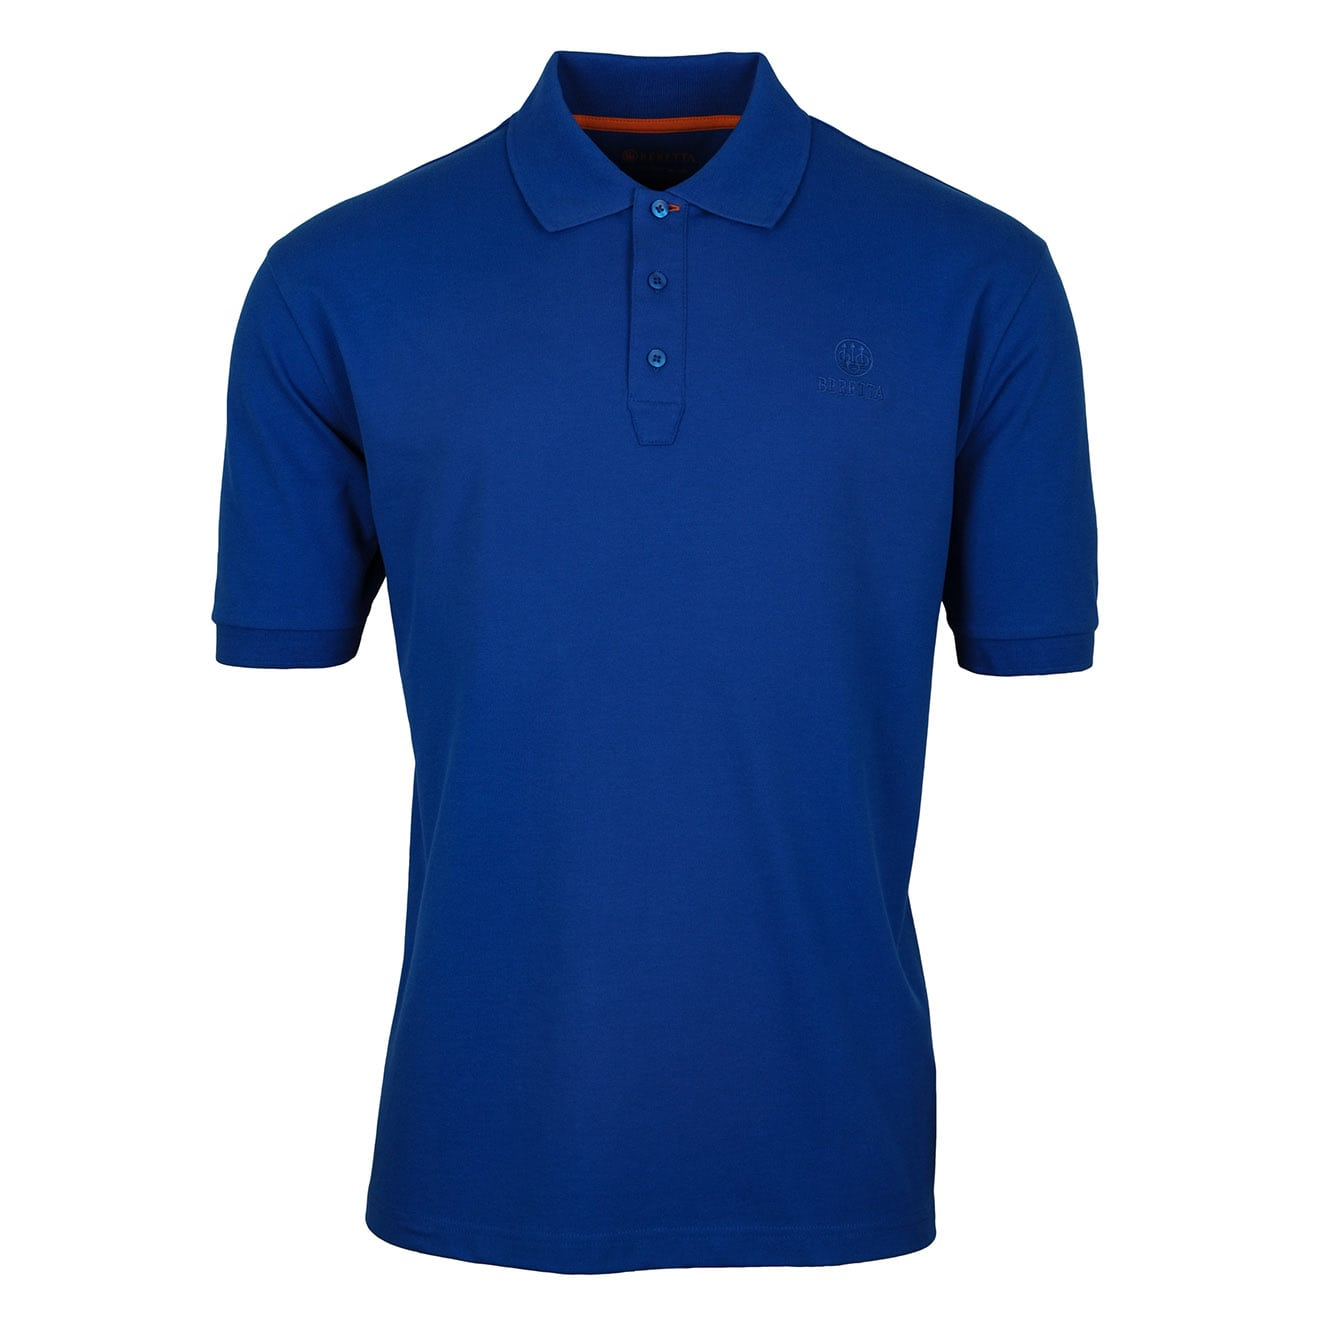 Beretta Corporate Polo Shirt Snorkel Blue